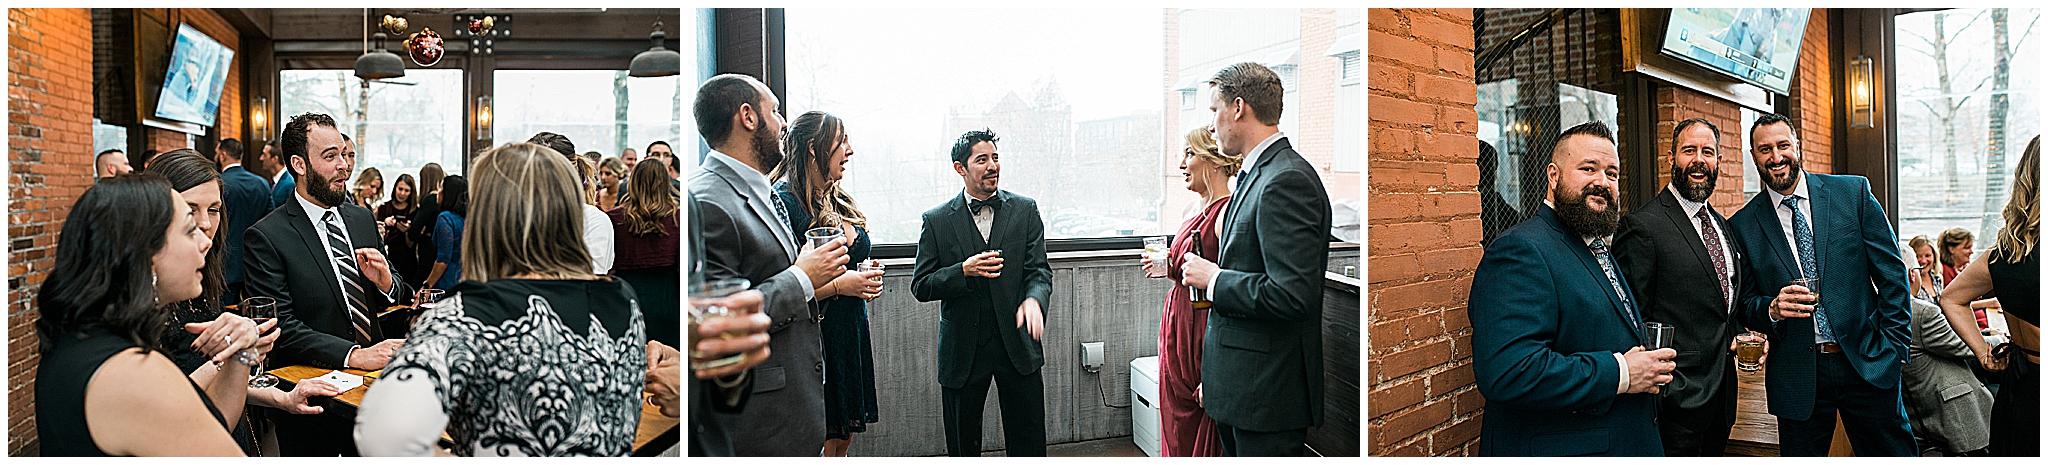 Wedding_Photographer_Asheville_Century_Room__0014.jpg